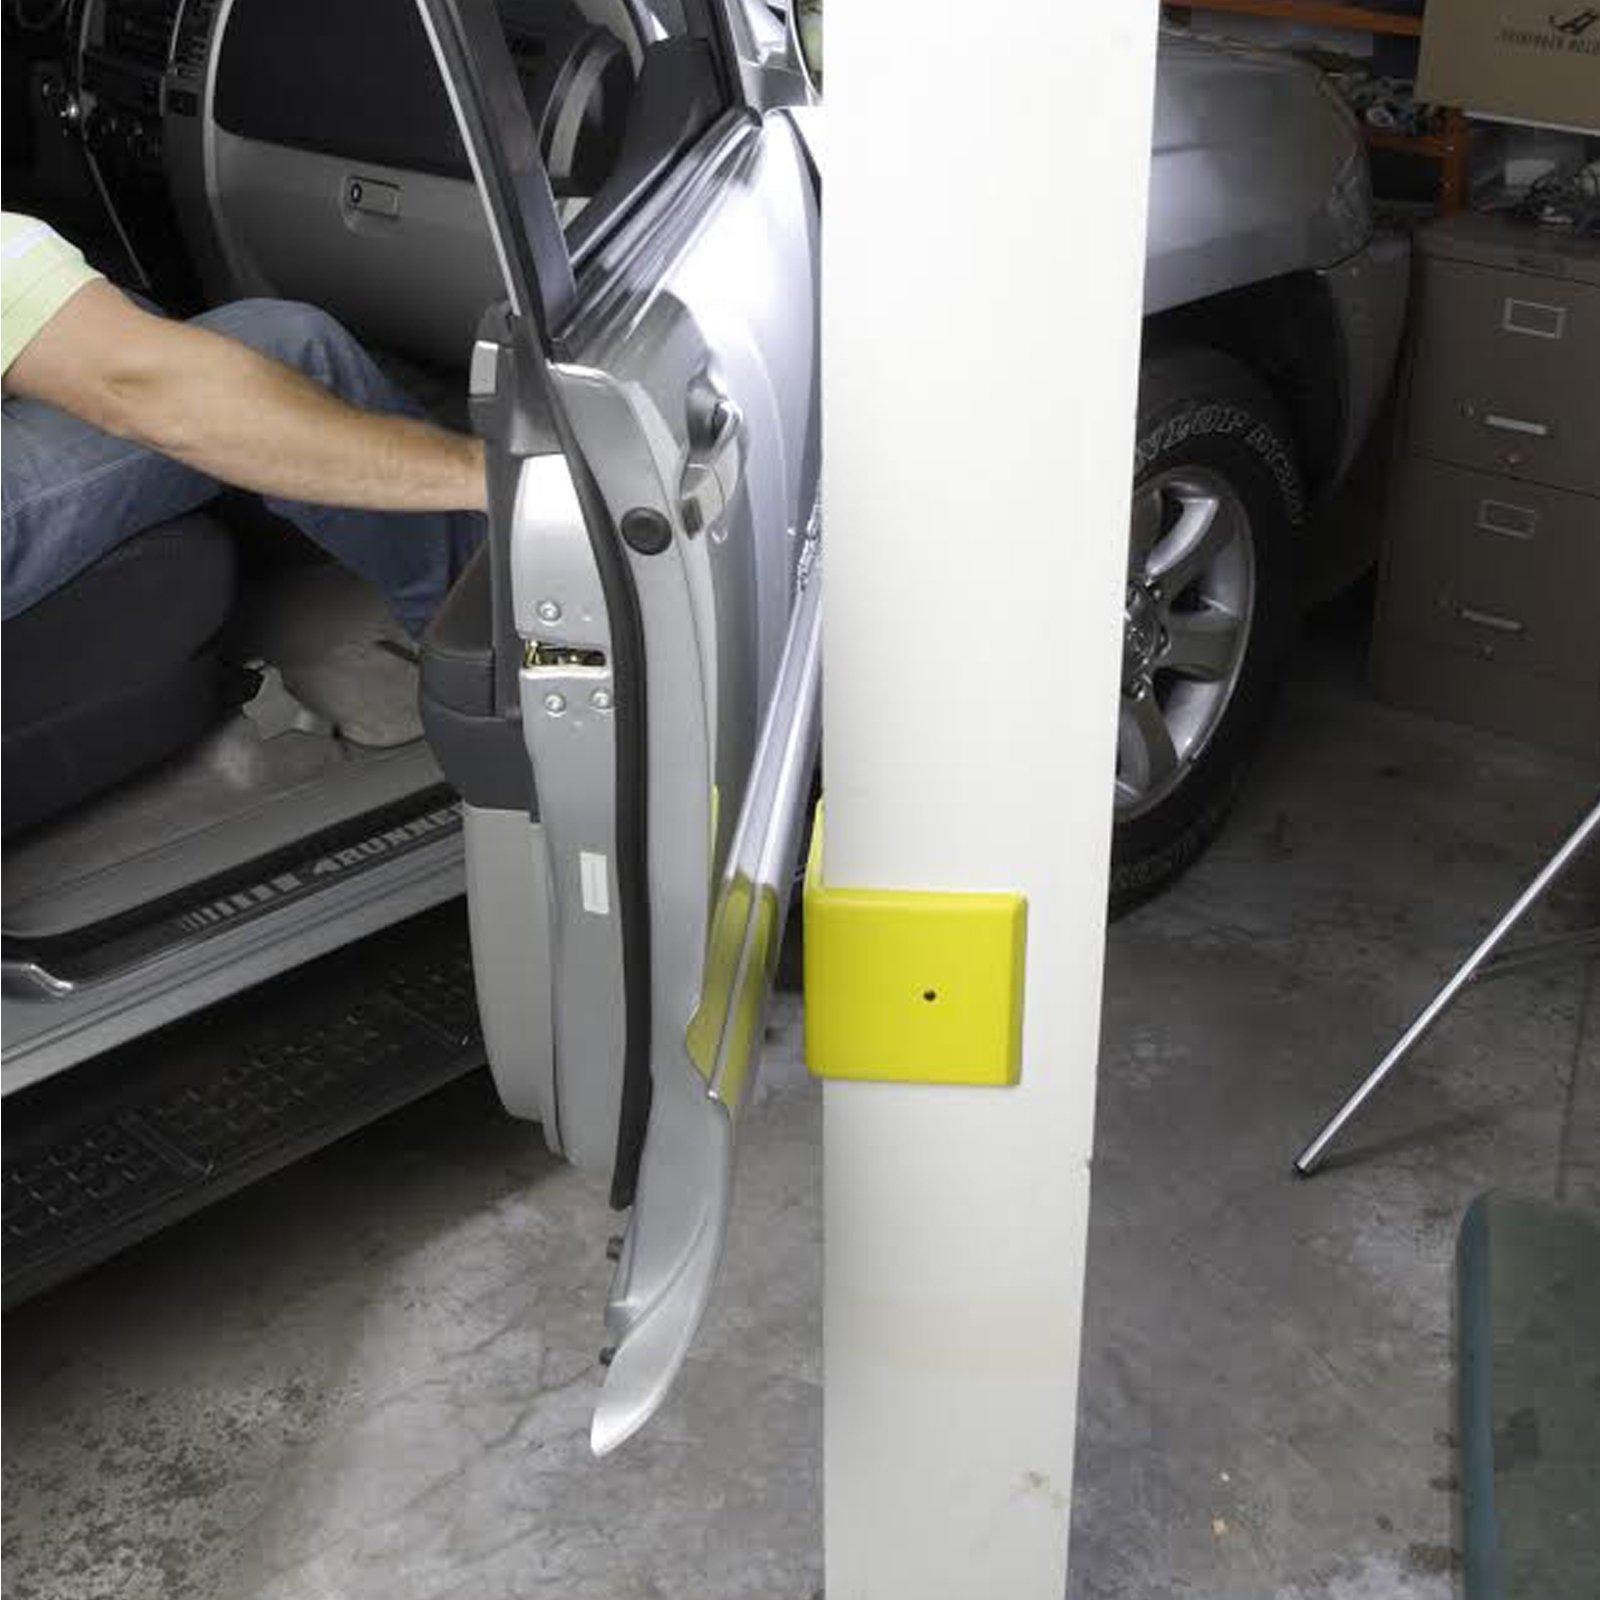 C16244TK Covercraft Custom Fit Car Cover for Volkswagen Beetle Technalon Evolution Fabric, Tan